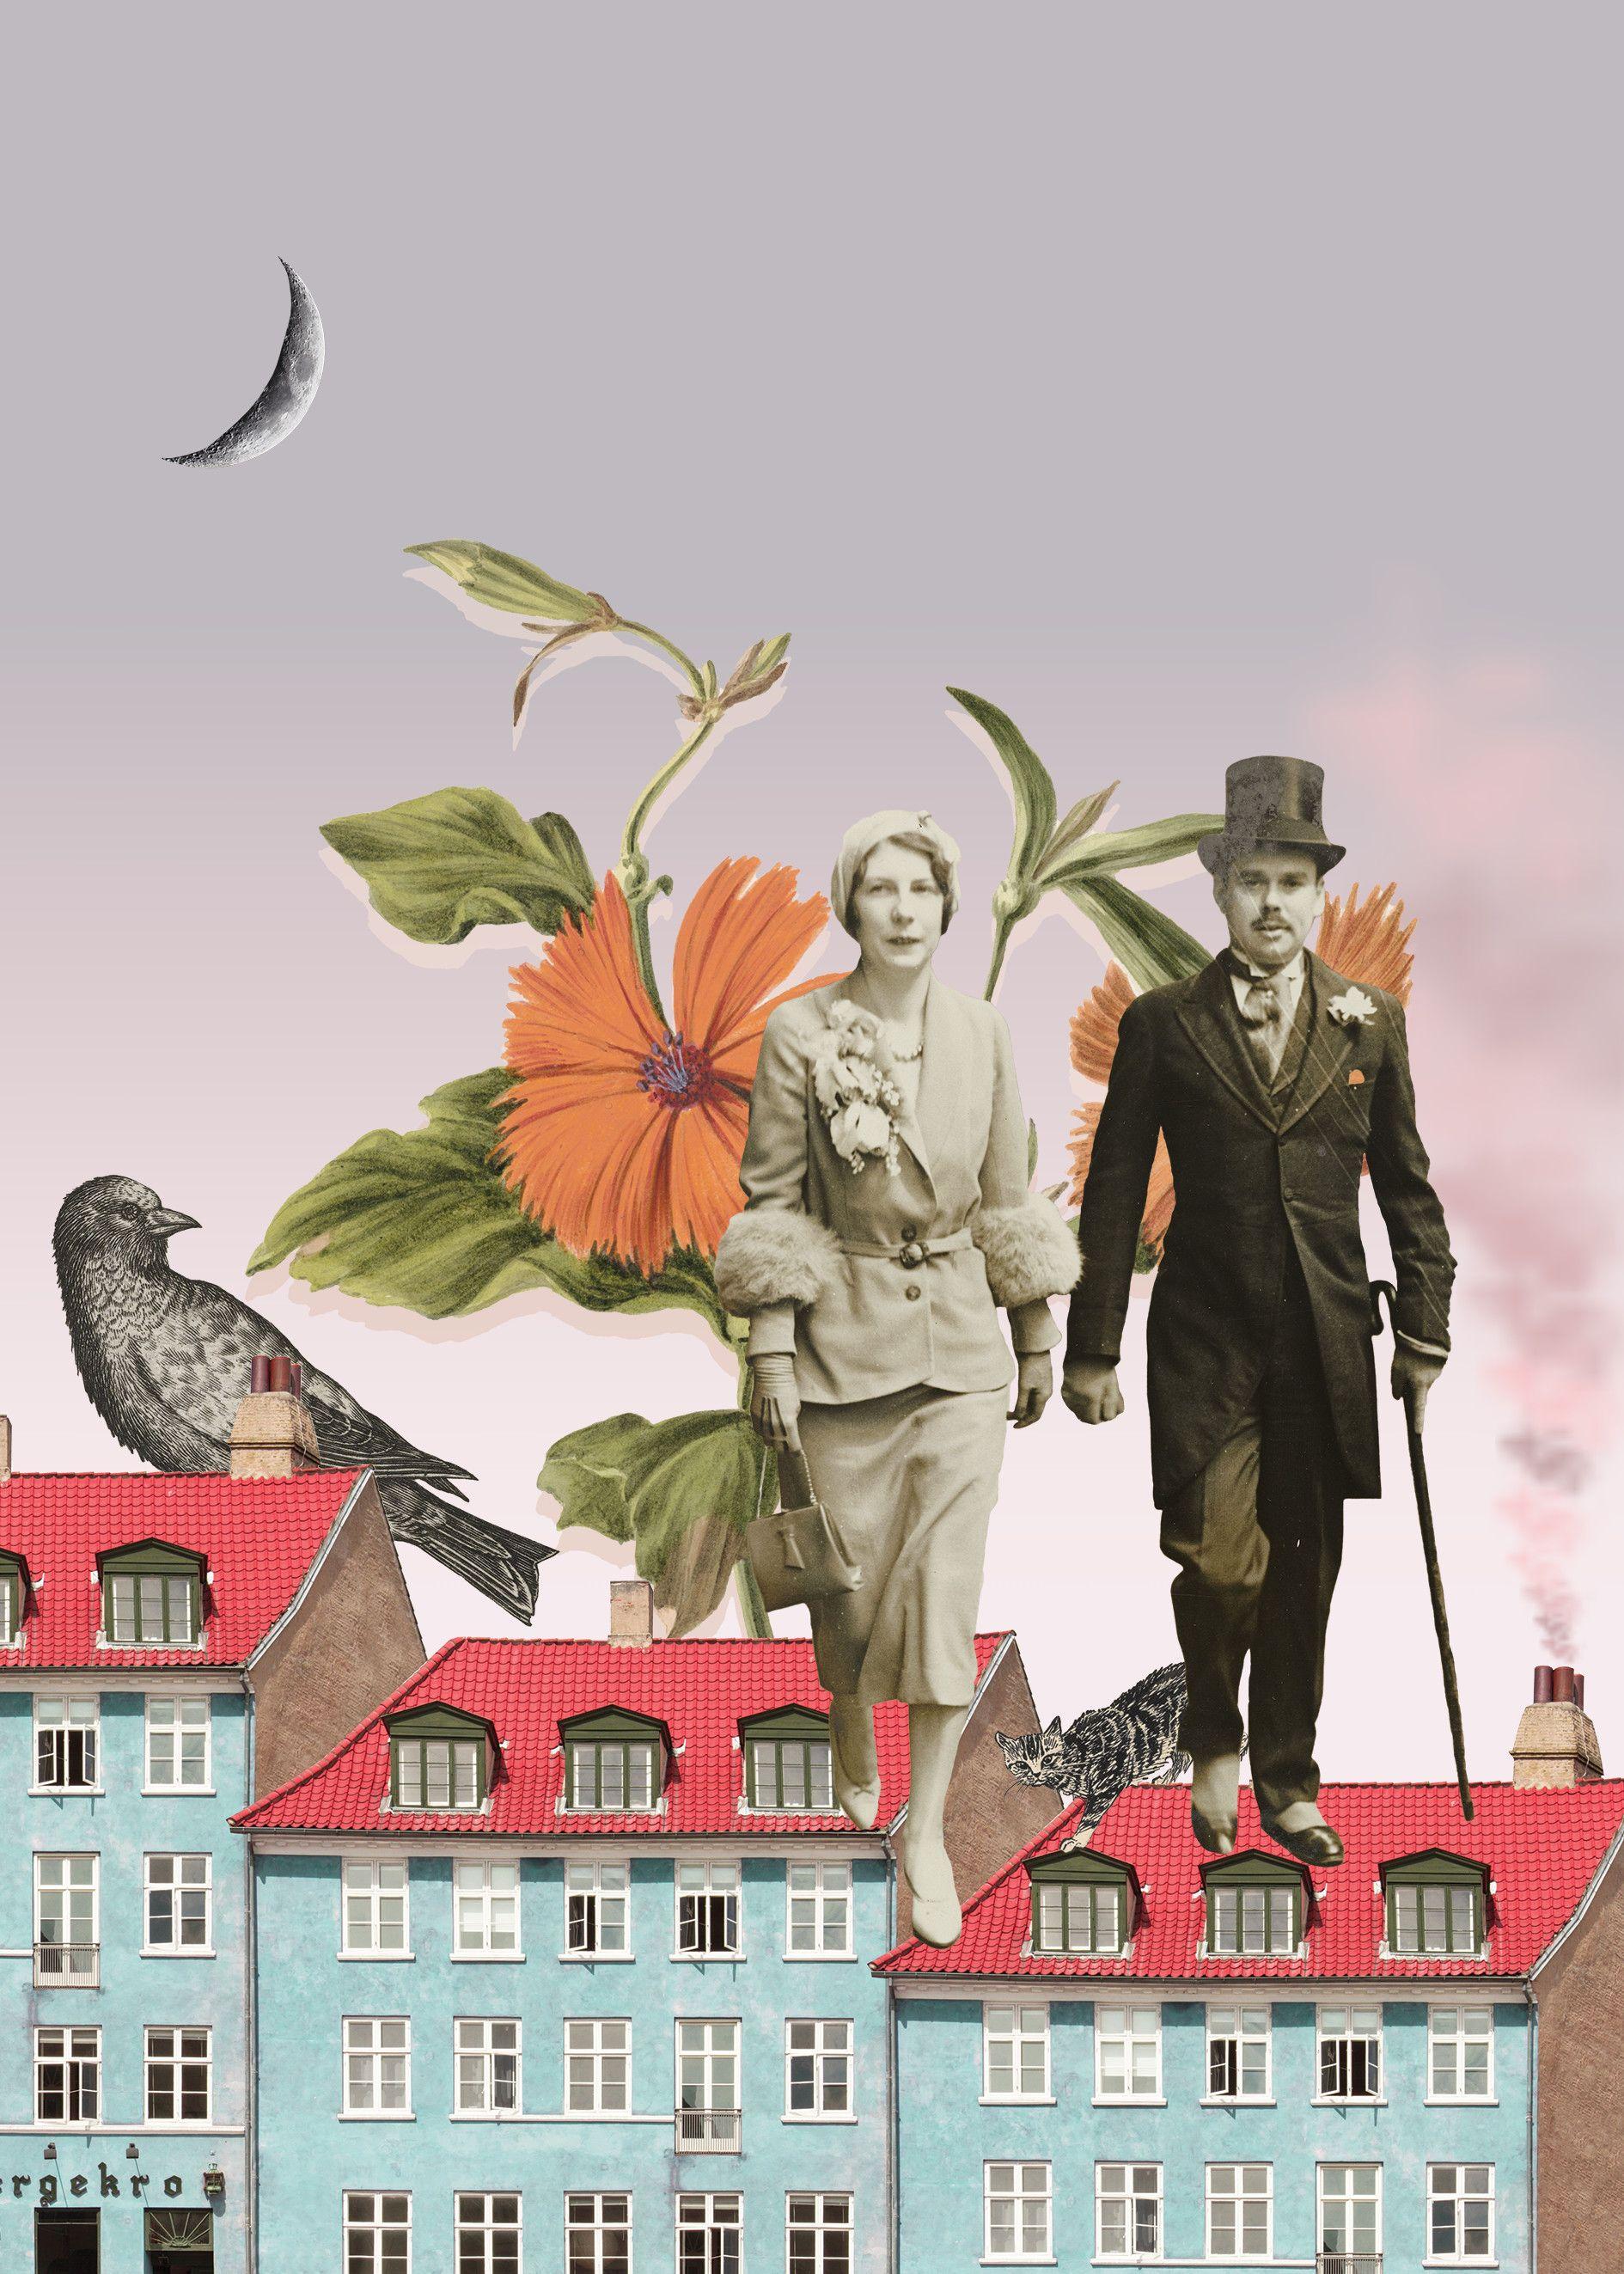 Collage Poster City Kolaz Plakat Dekoracyjny Miasto With